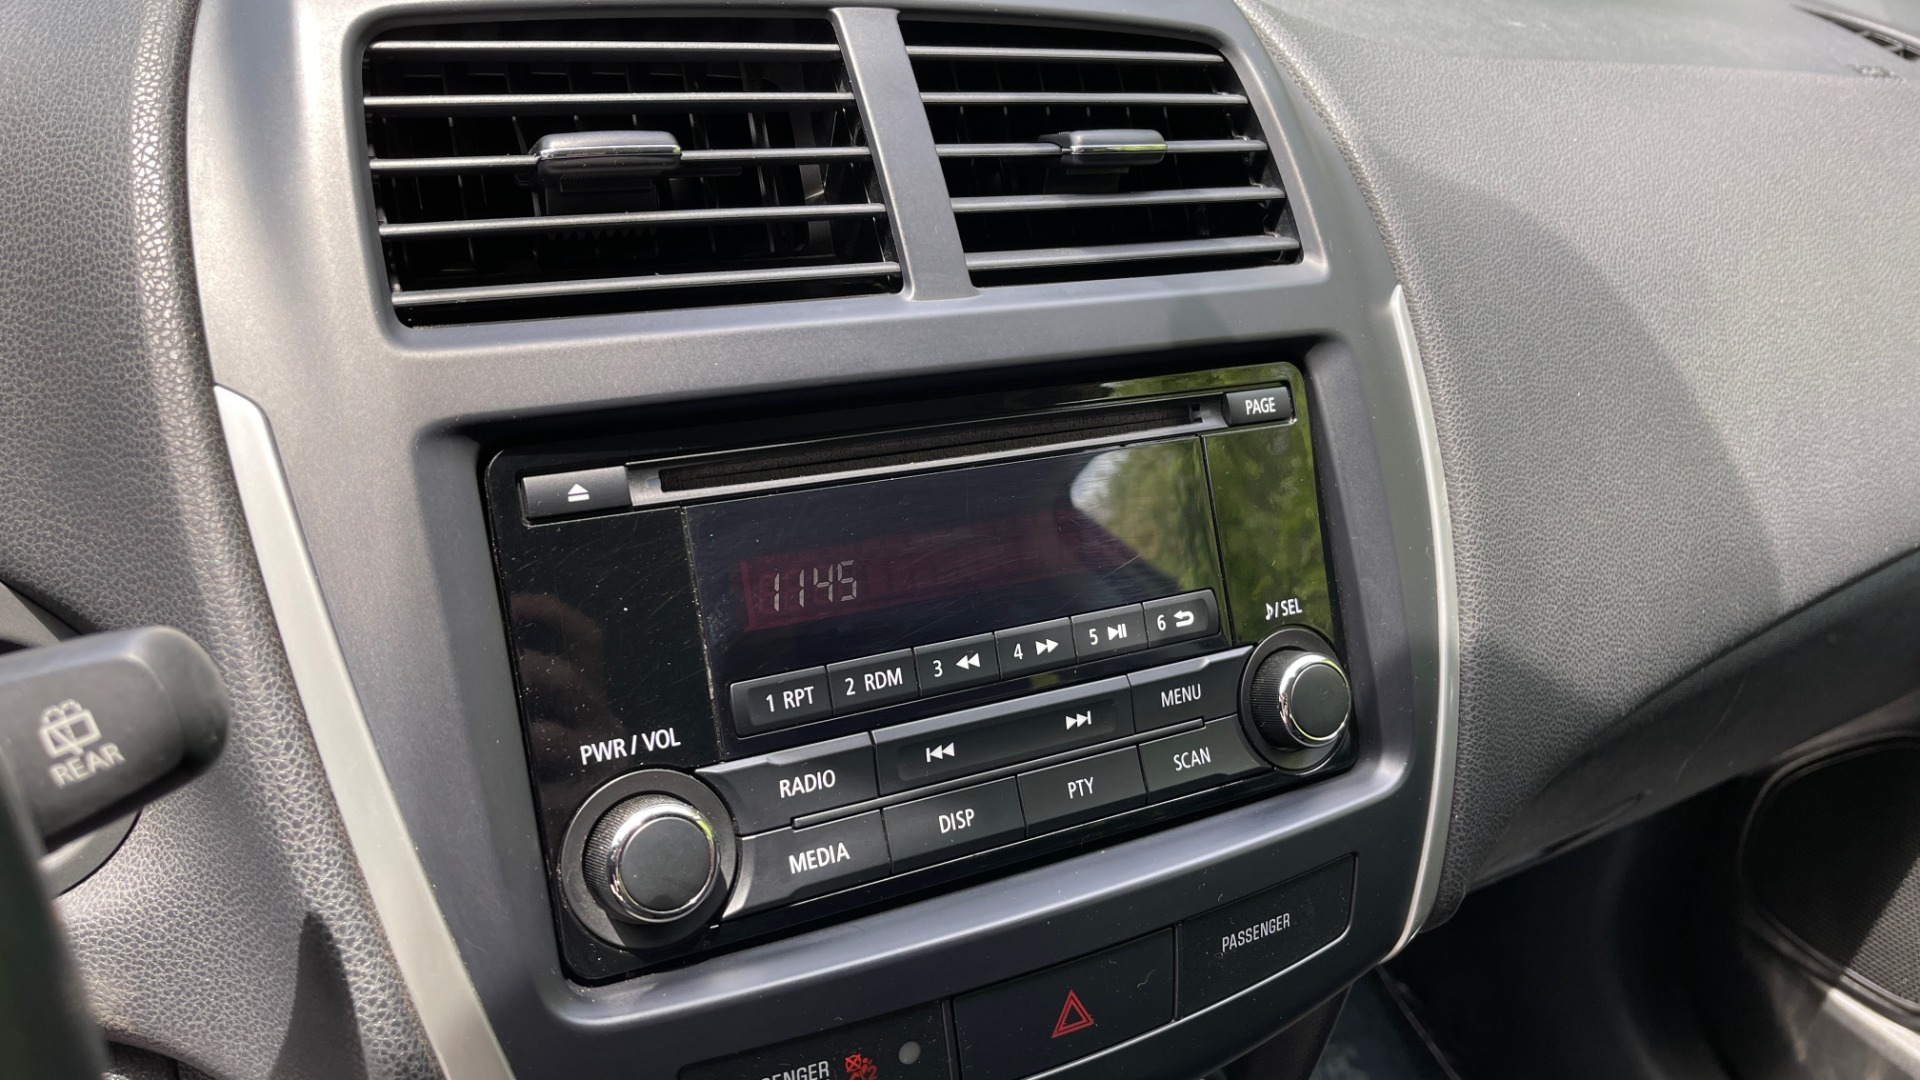 Used 2014 Mitsubishi OUTLANDER SPORT ES 2WD / 2.0L / CVT TRANS / 18IN WHEELS / 31MPG for sale $8,495 at Formula Imports in Charlotte NC 28227 34